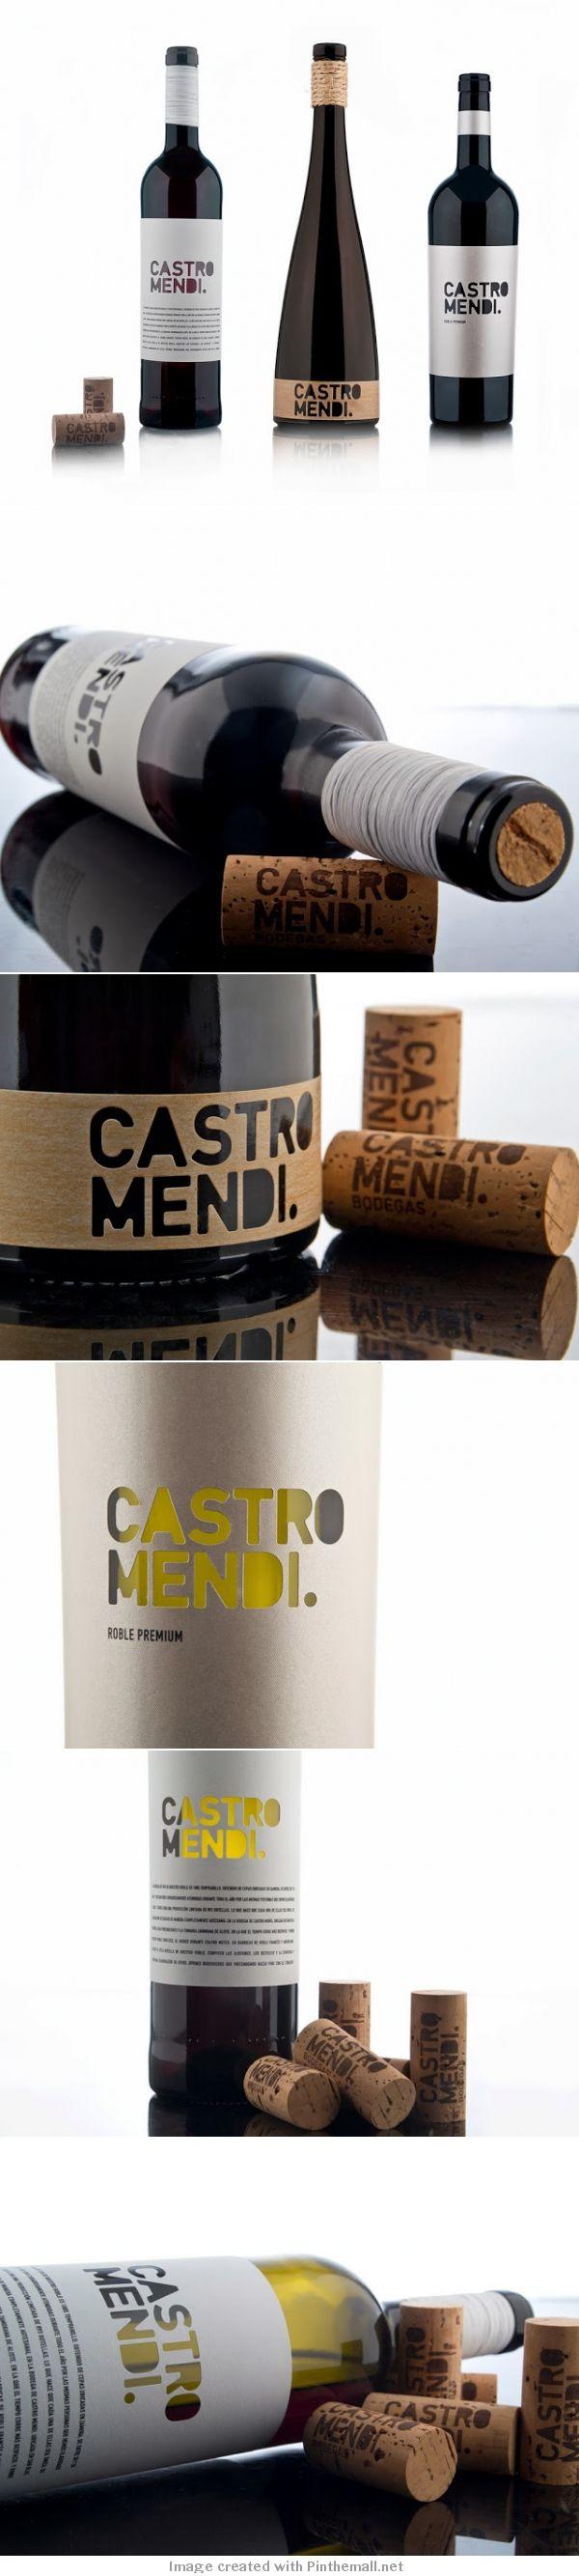 Bodegas Castro Mendi ##wine #packaging PD